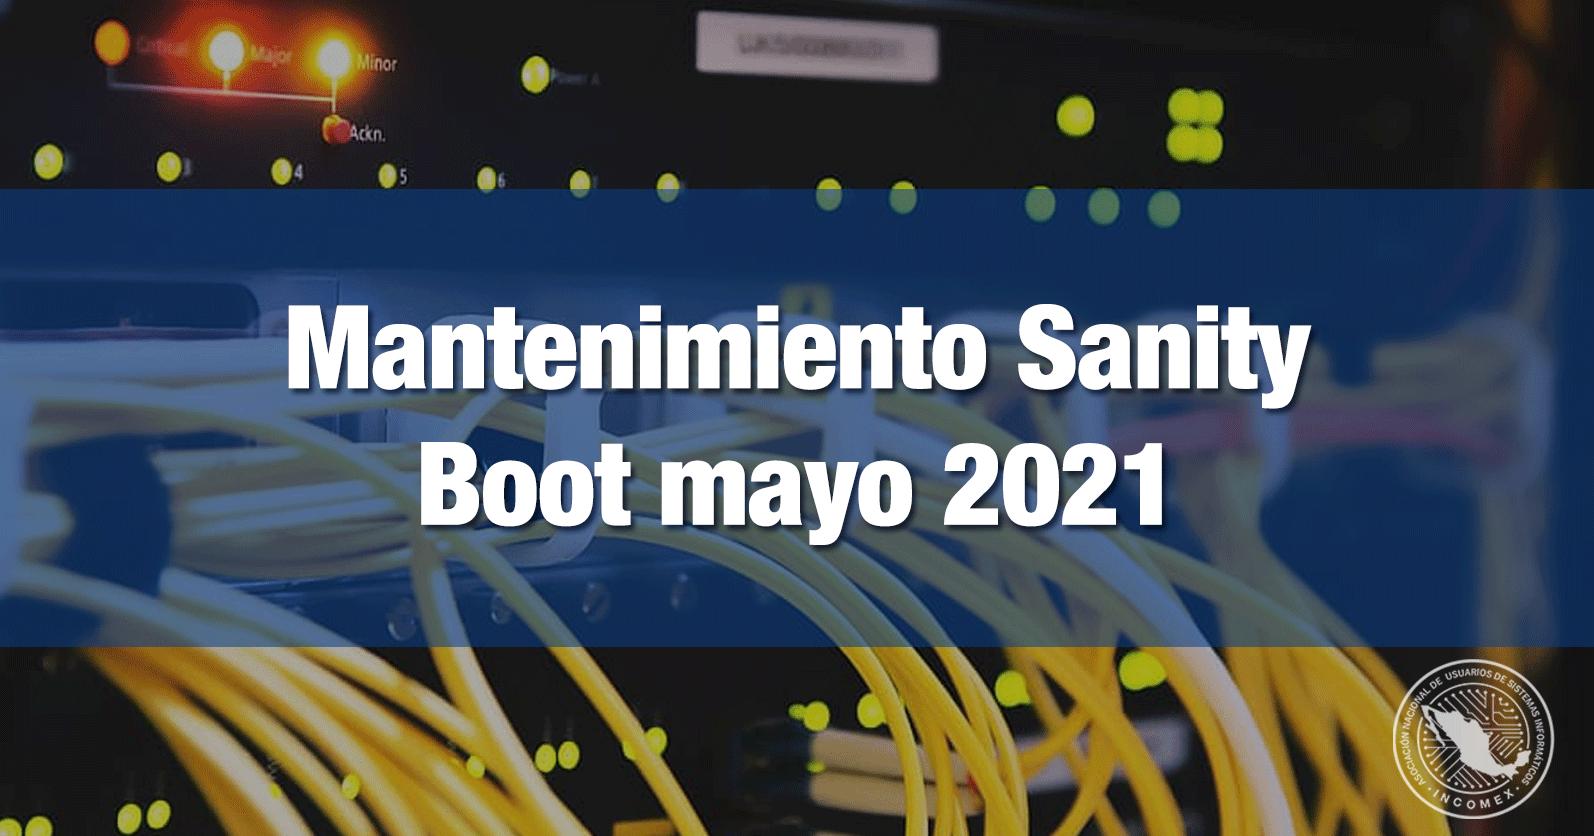 Mantenimiento Sanity Boot mayo 2021